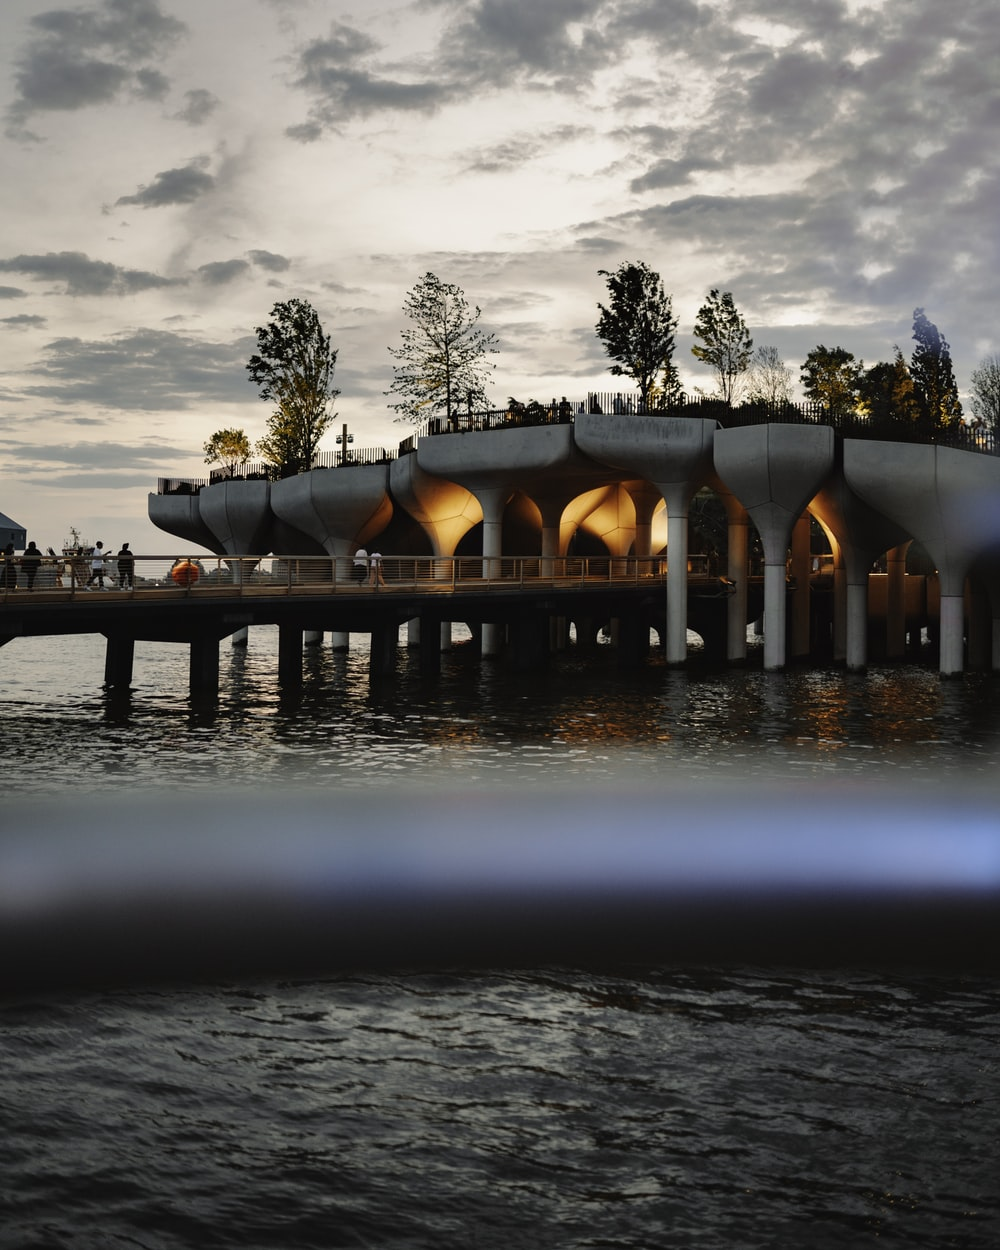 brown concrete bridge over water